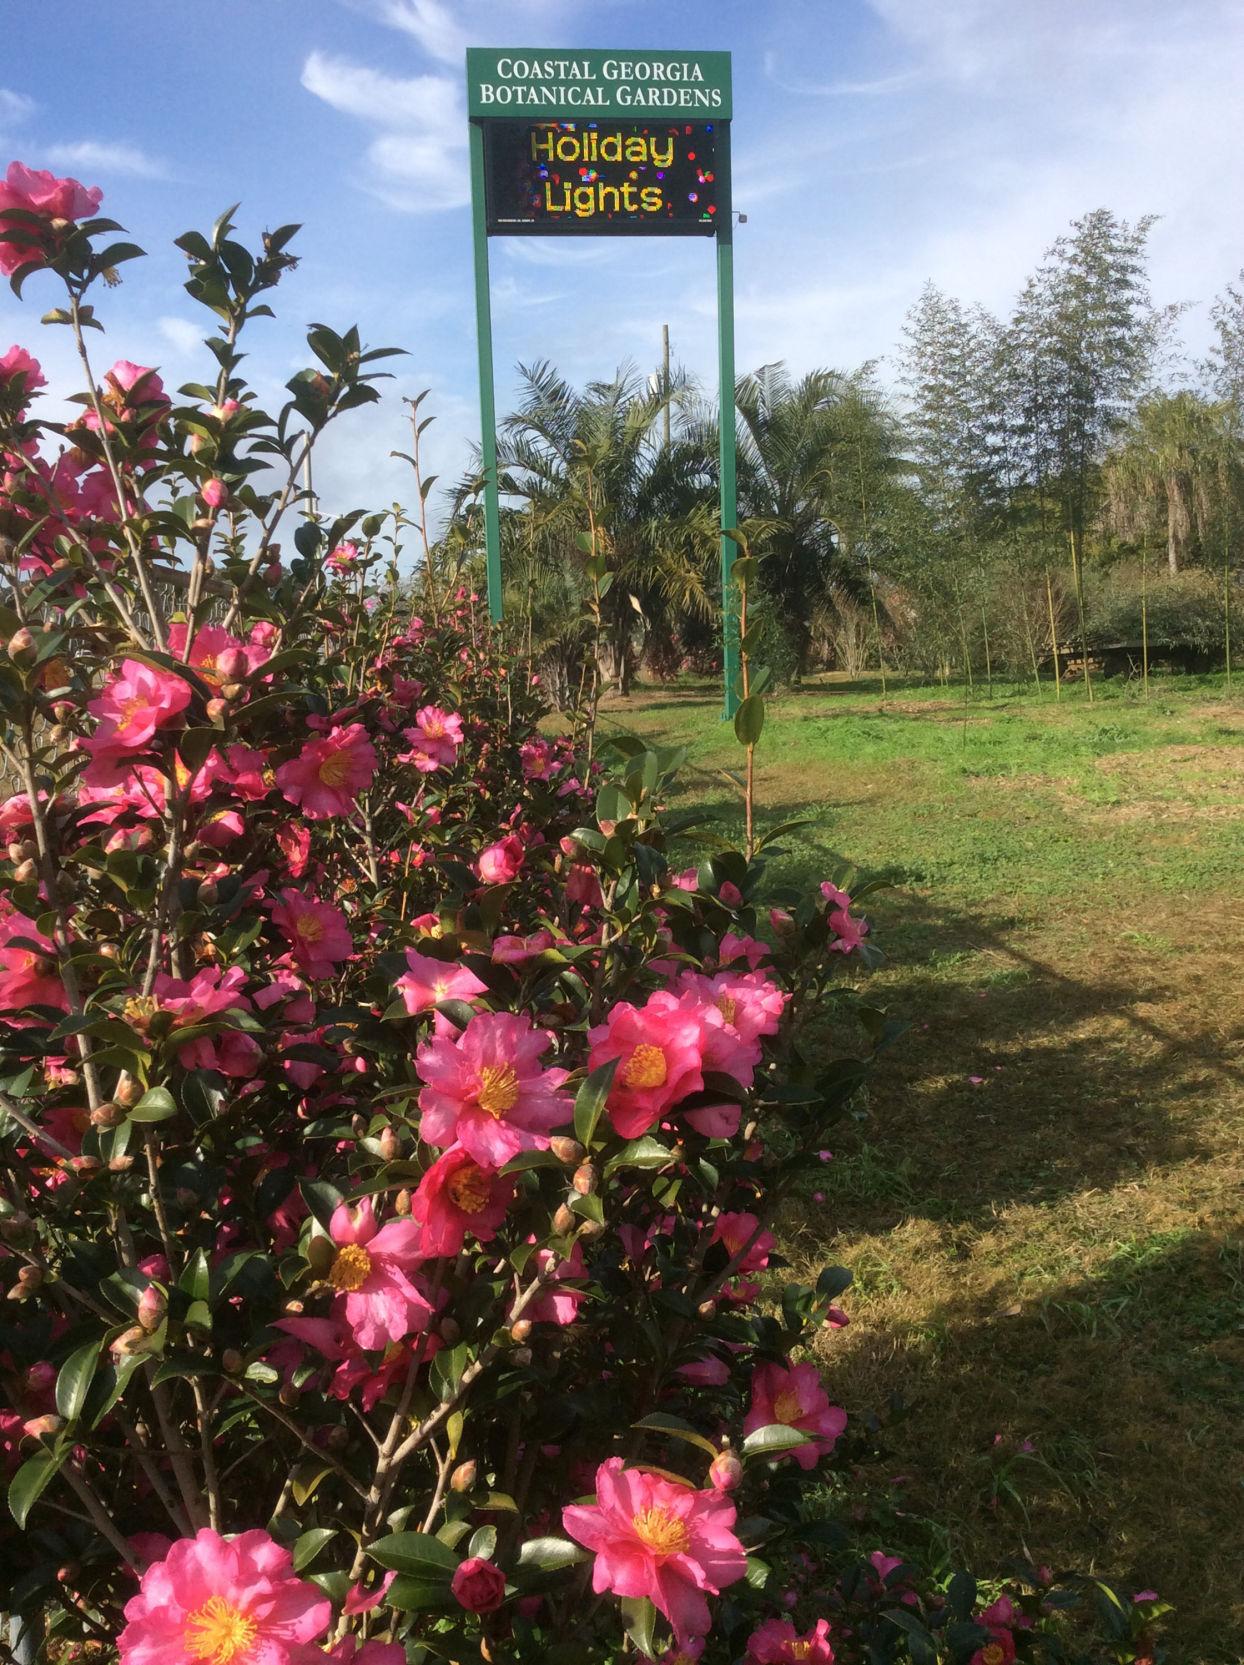 ON GARDENING: Kanjiro Camellia Has Stood The Test Of Time